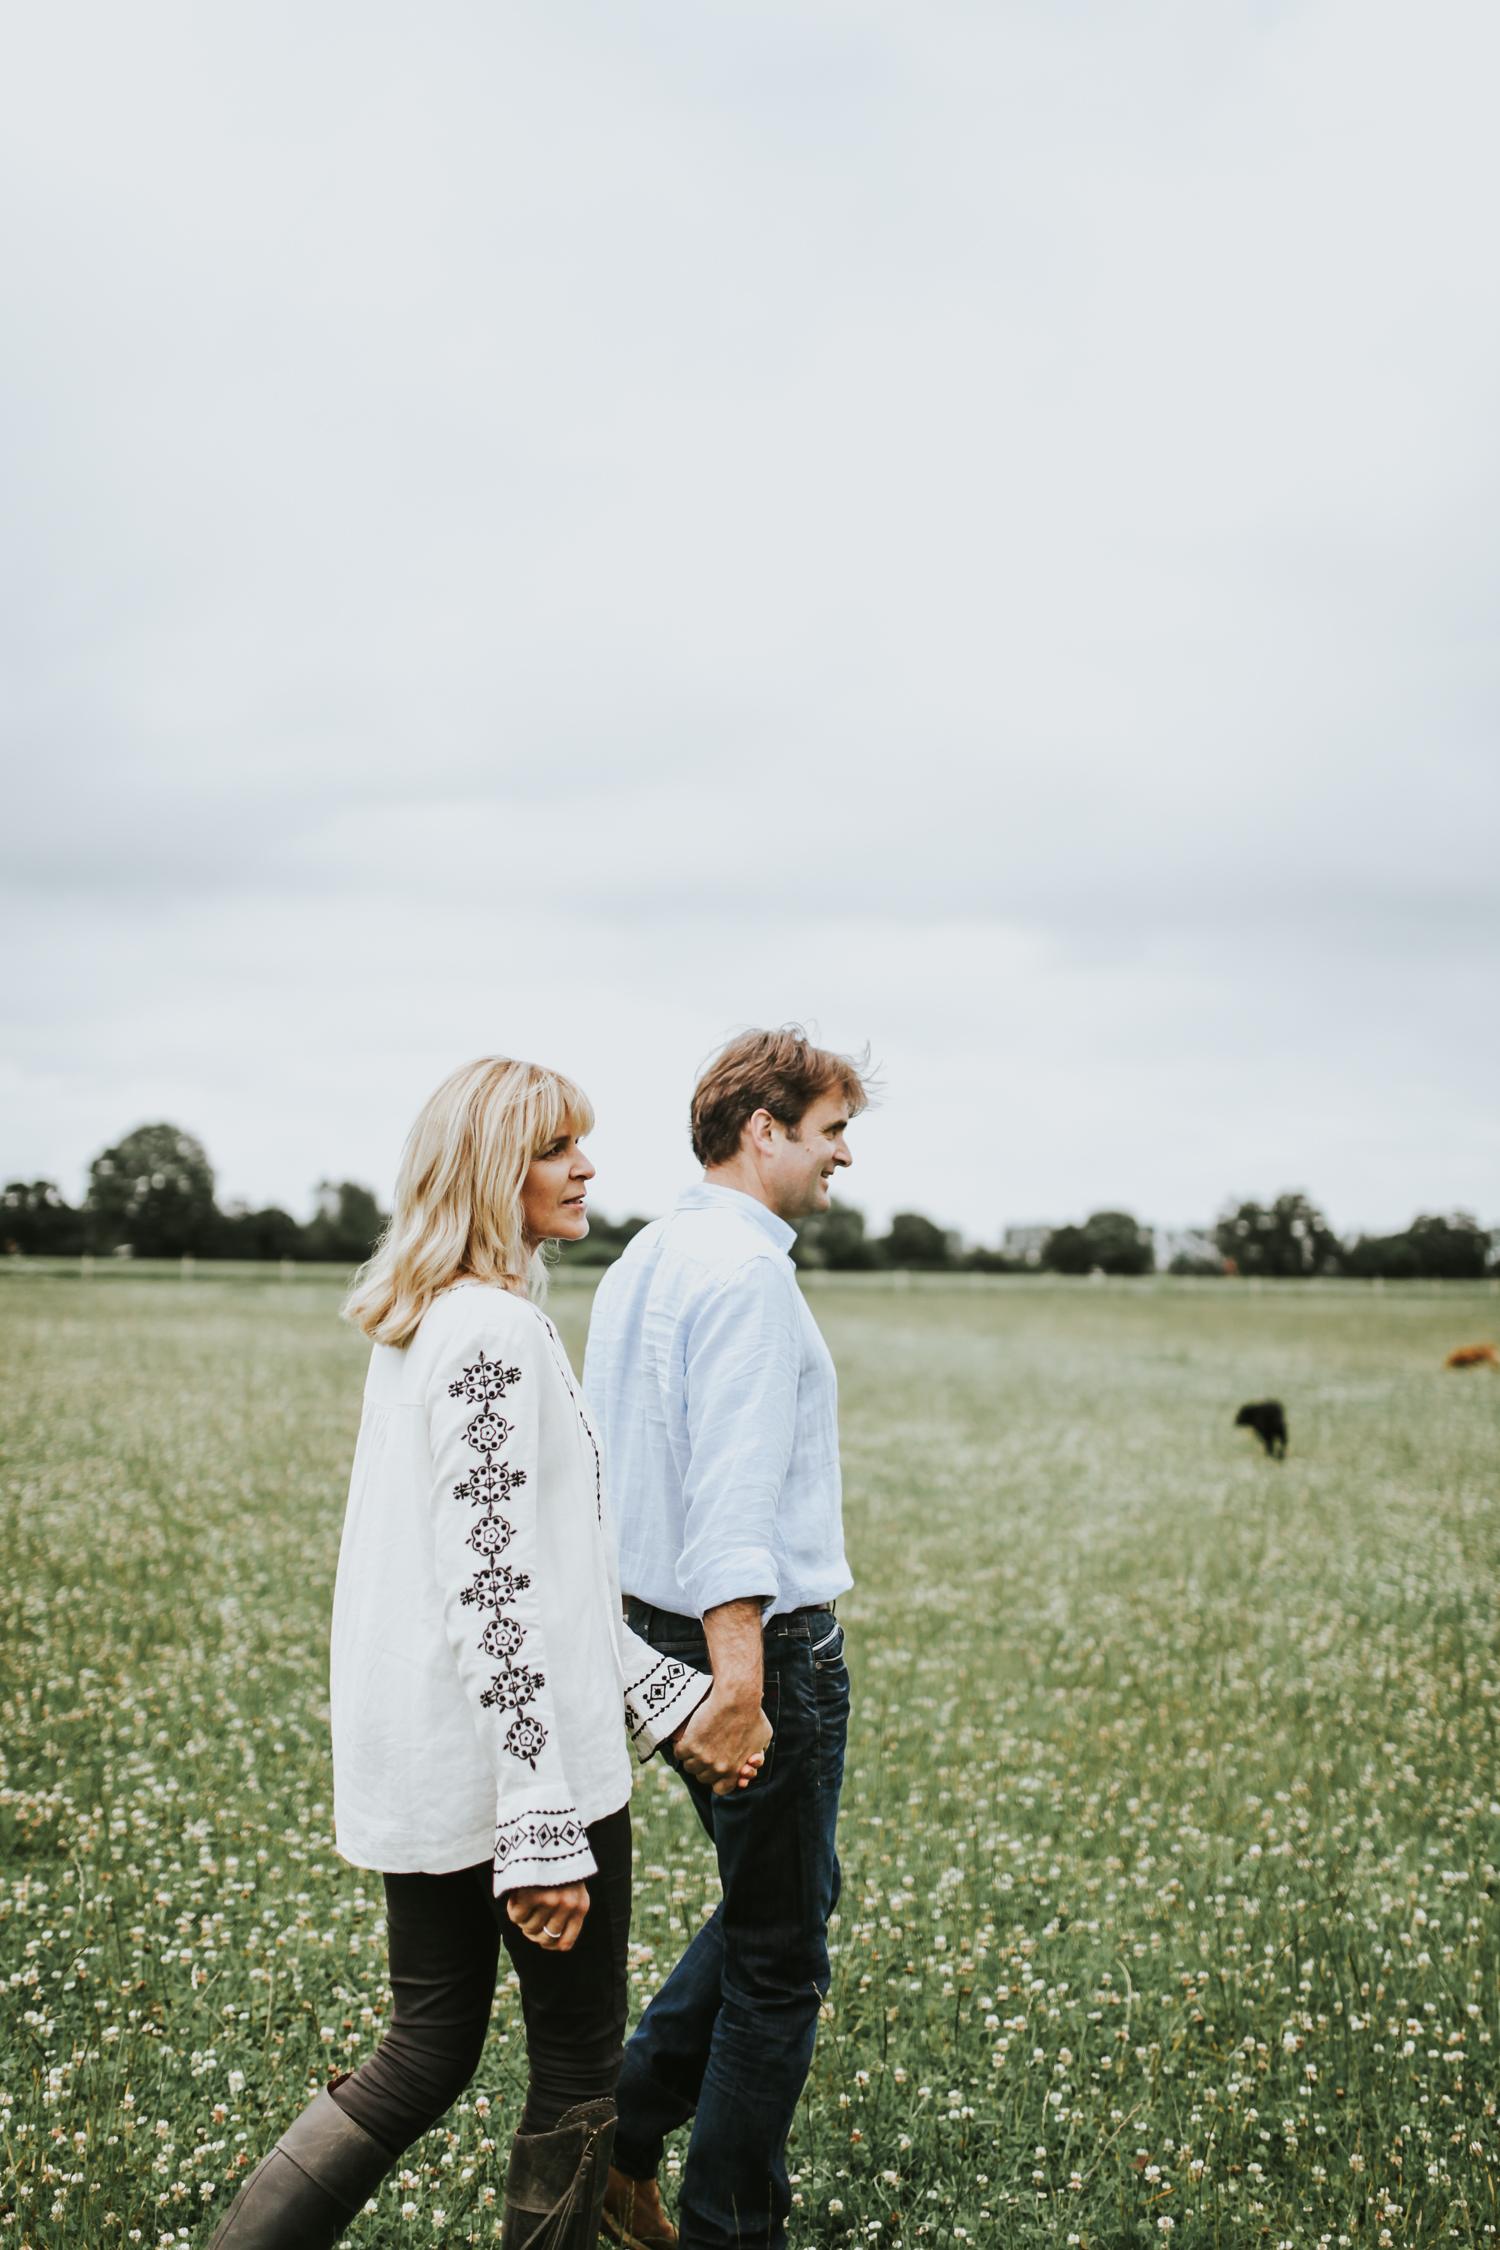 Engagement-Shoot-Session-Norfolk-Devon-Photography-Photographer-Dartmouth-Southhams-27.jpg